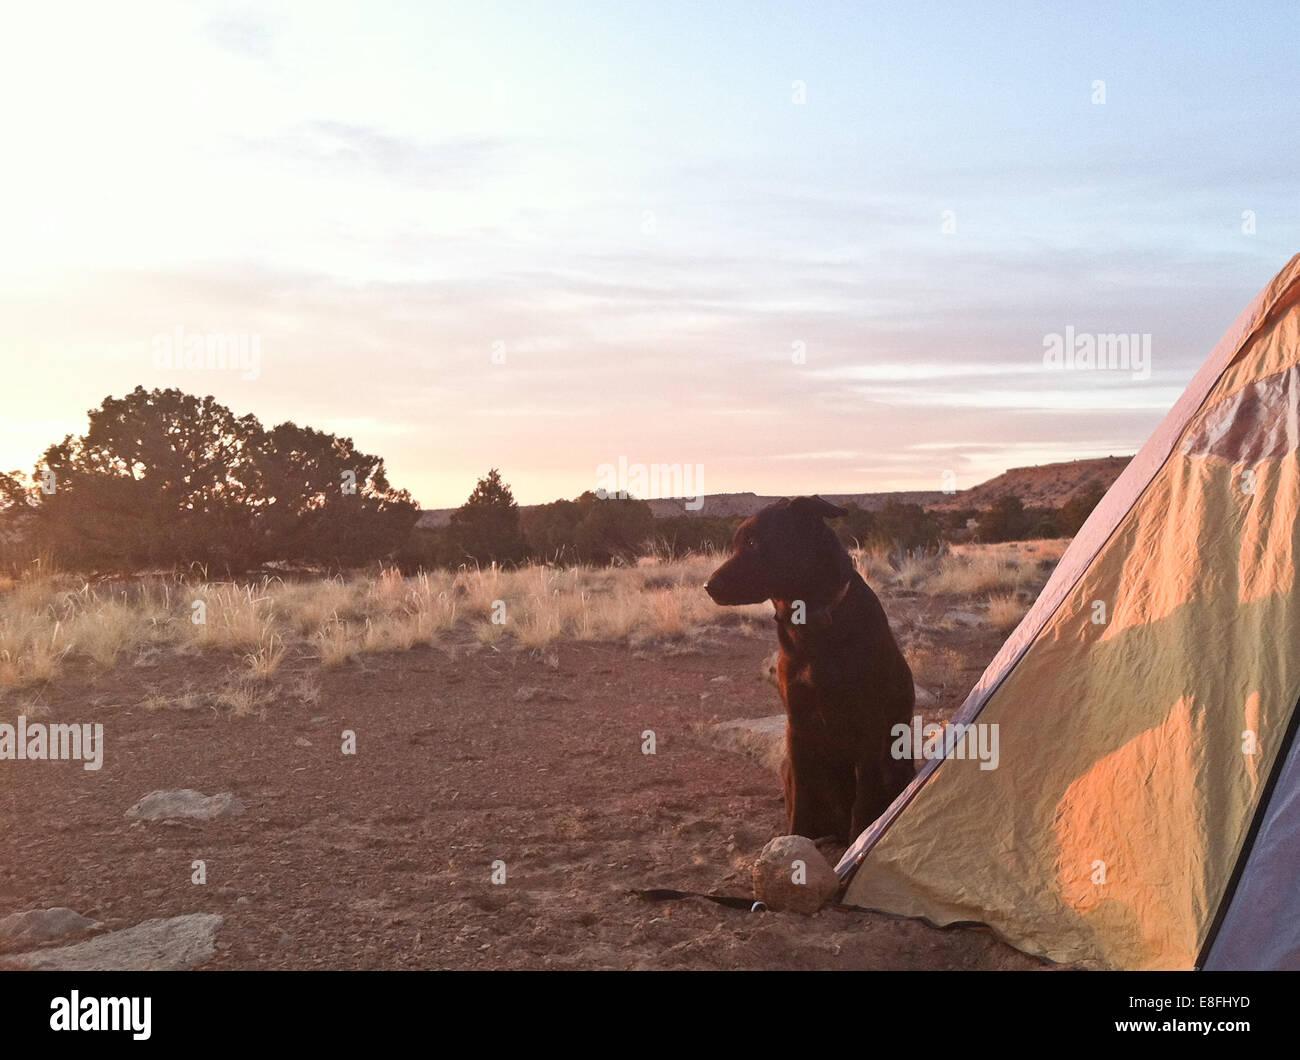 Dog sitting outside tent Stock Photo: 74102097 - Alamy